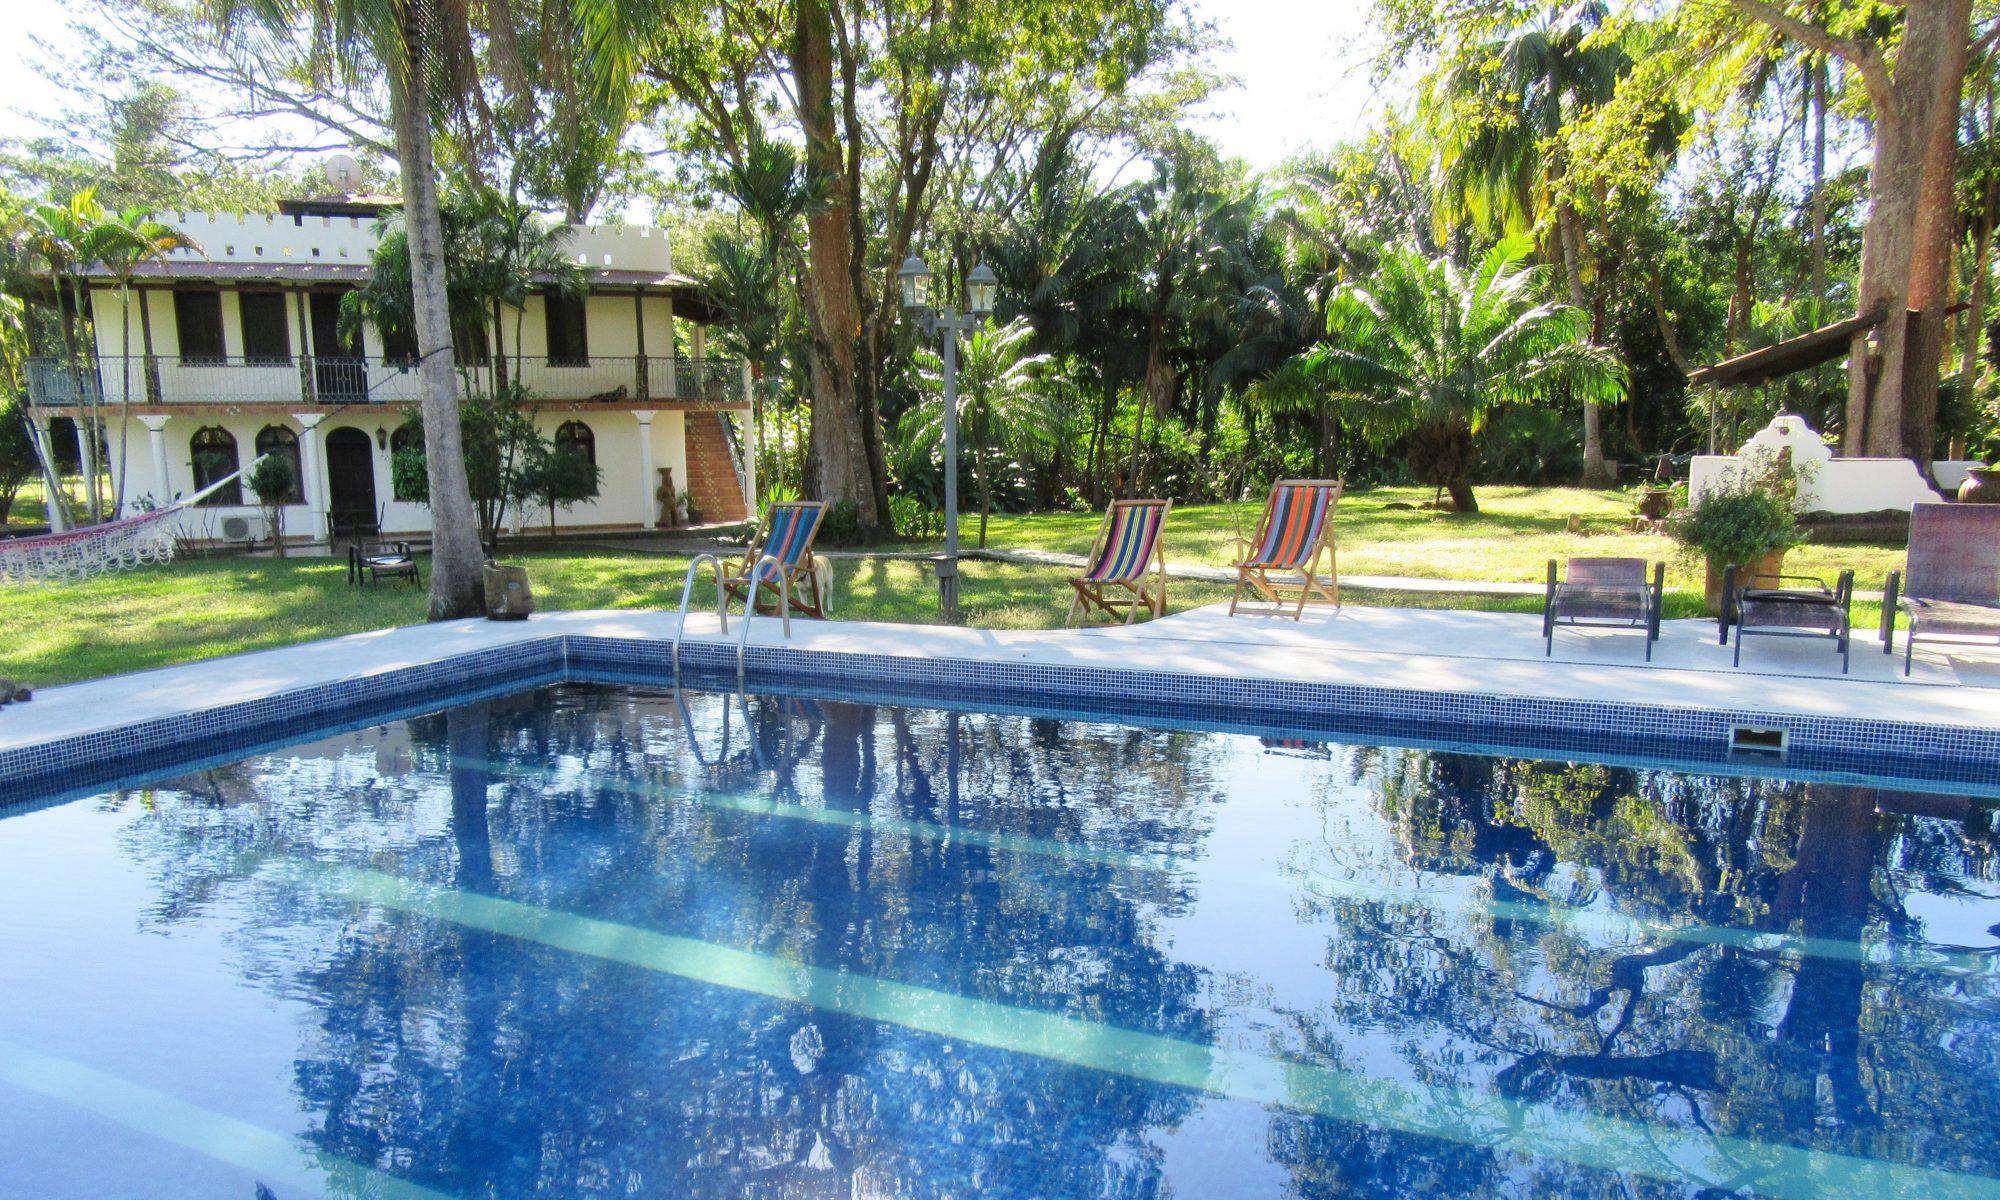 Individualität statt Massentourismus im Hotel-Costa-Rica-Pool